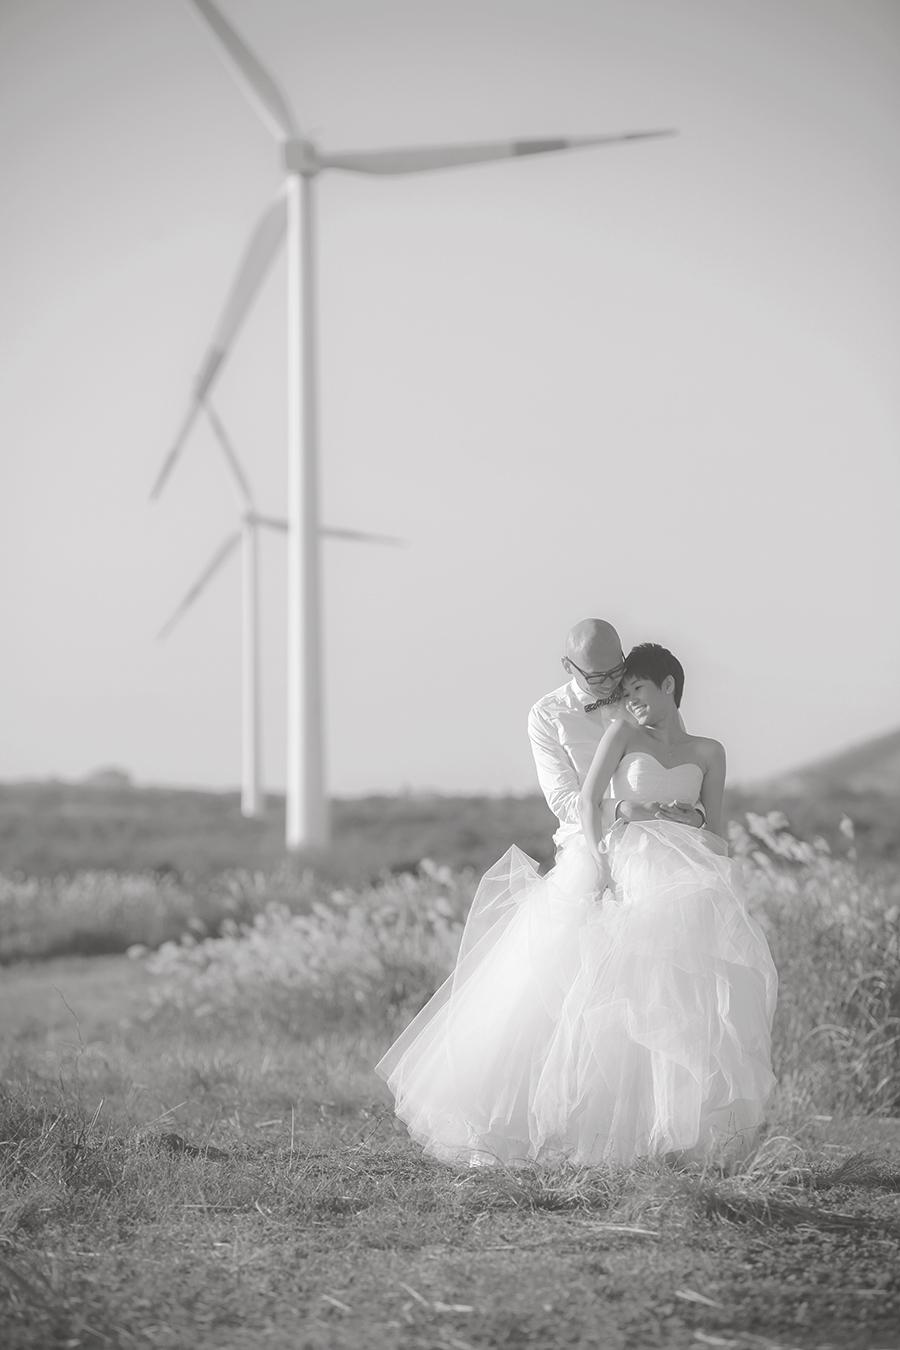 seoul jeju korea . wedding photography by kurt ahs . steve+chloe . 8054.jpg